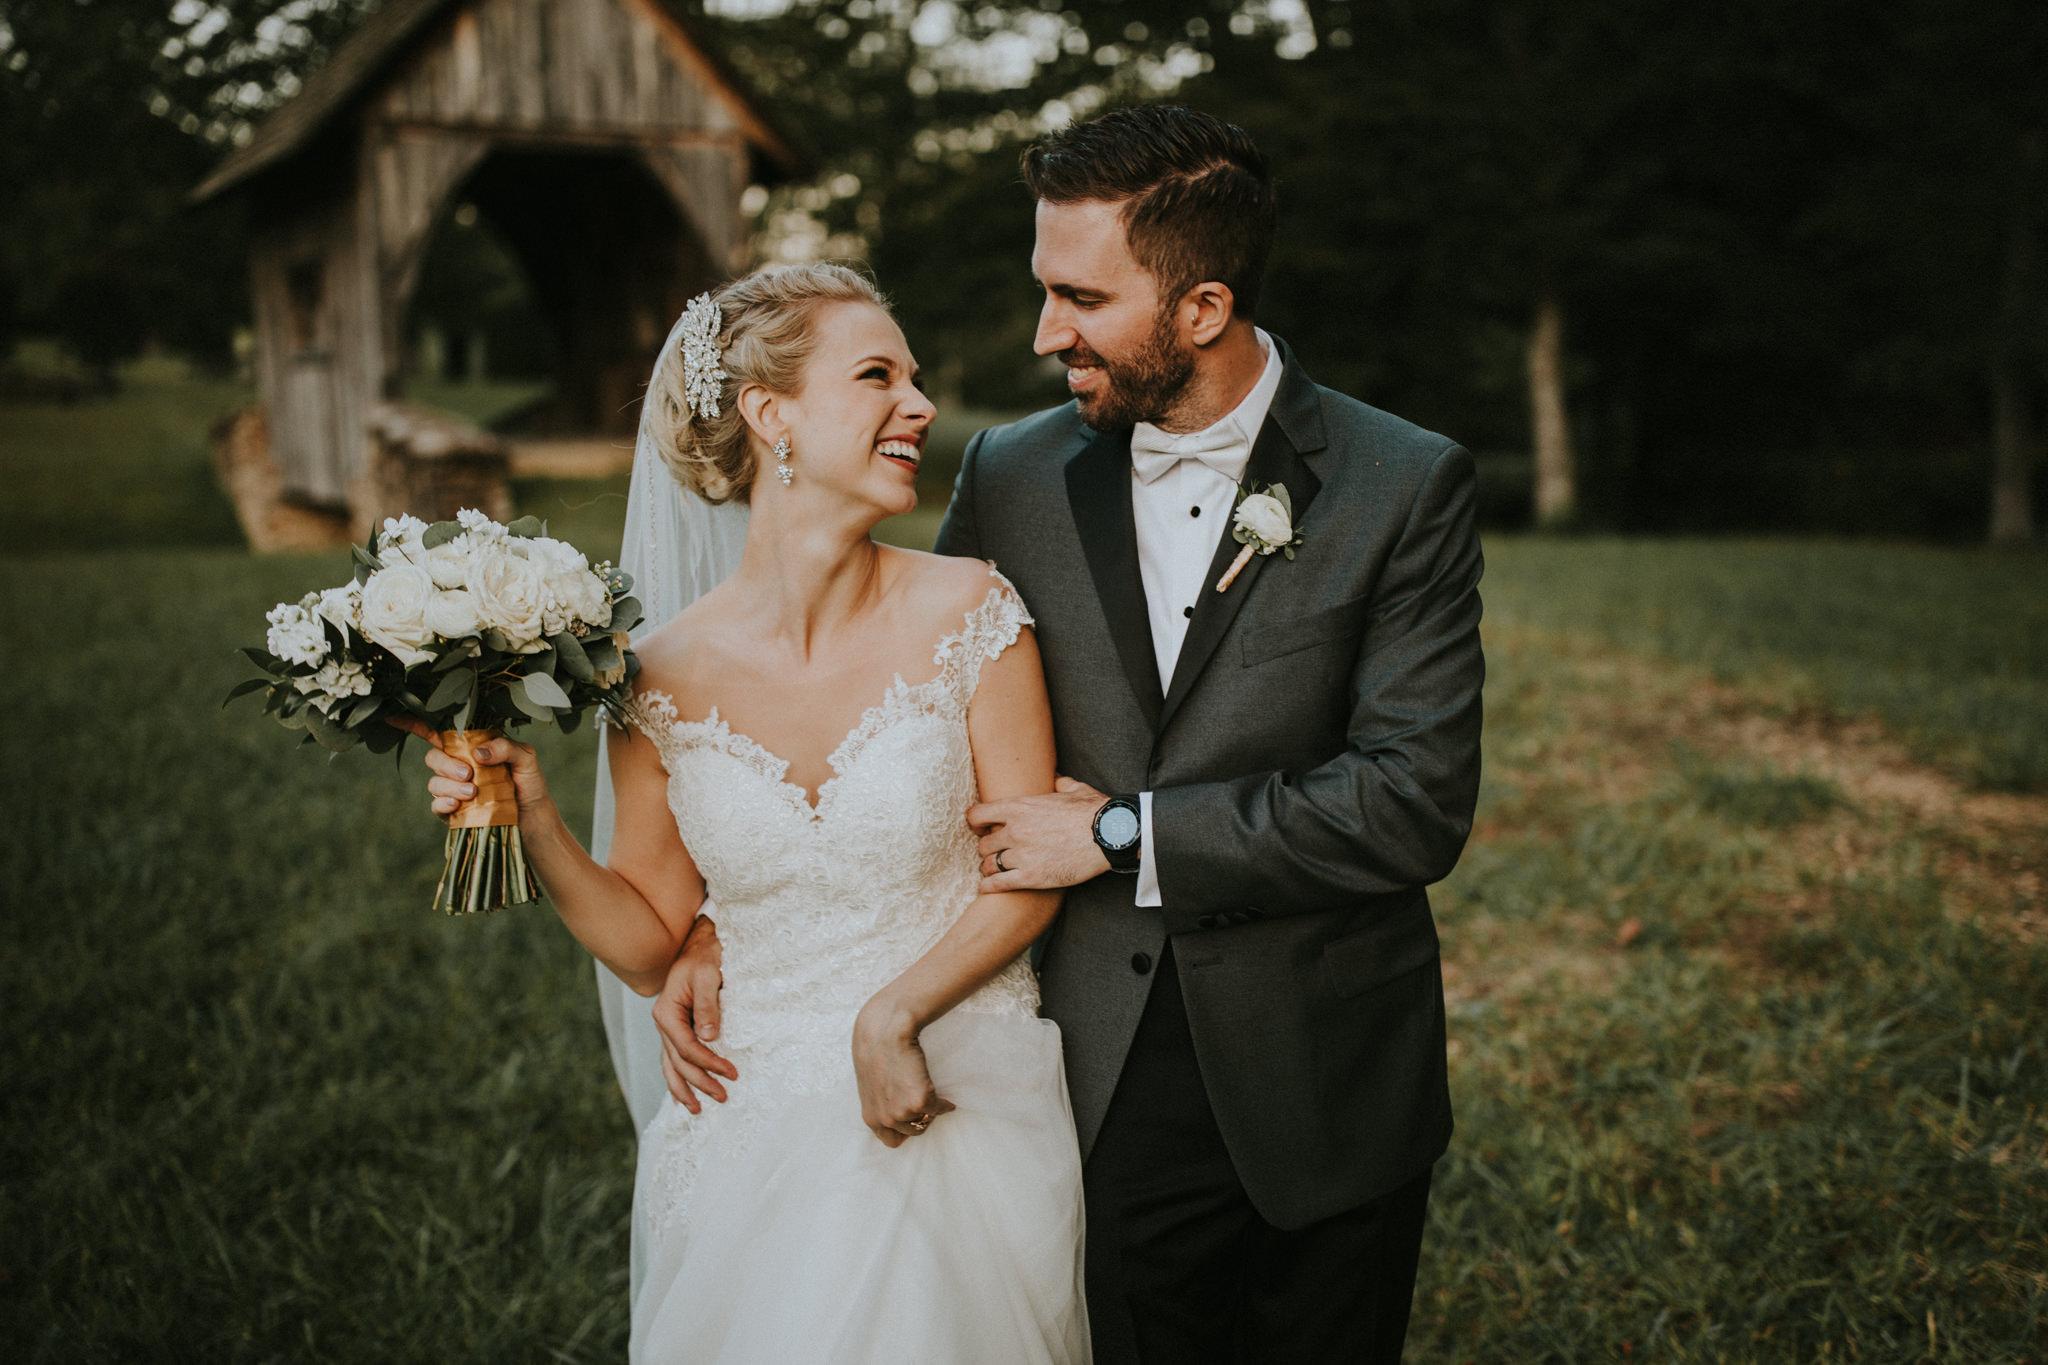 Wedding Photographer Sioux Falls